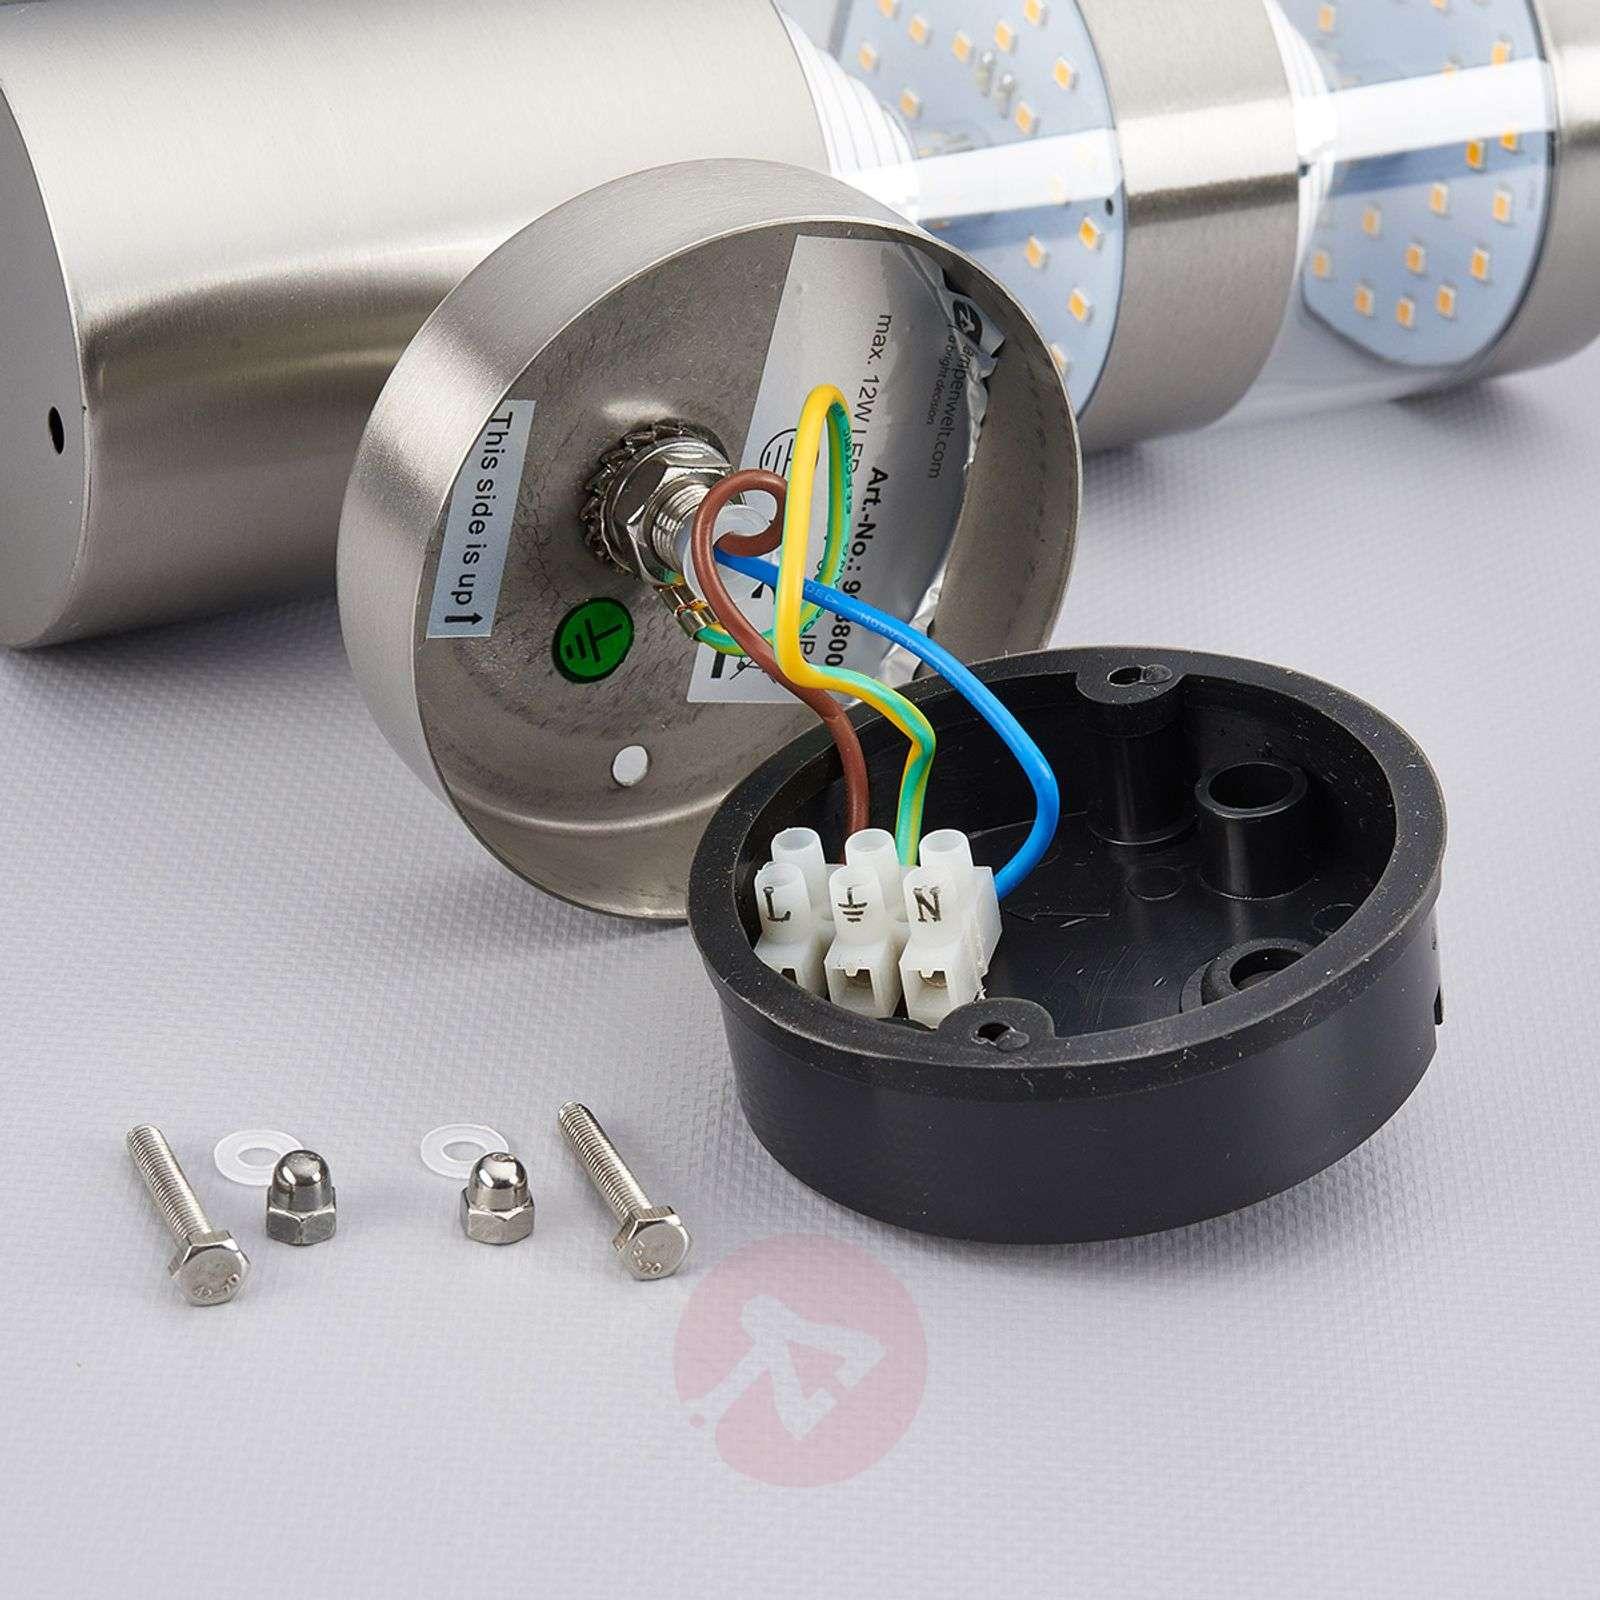 LED outdoor wall light Lanea with motion sensor-9988006-02